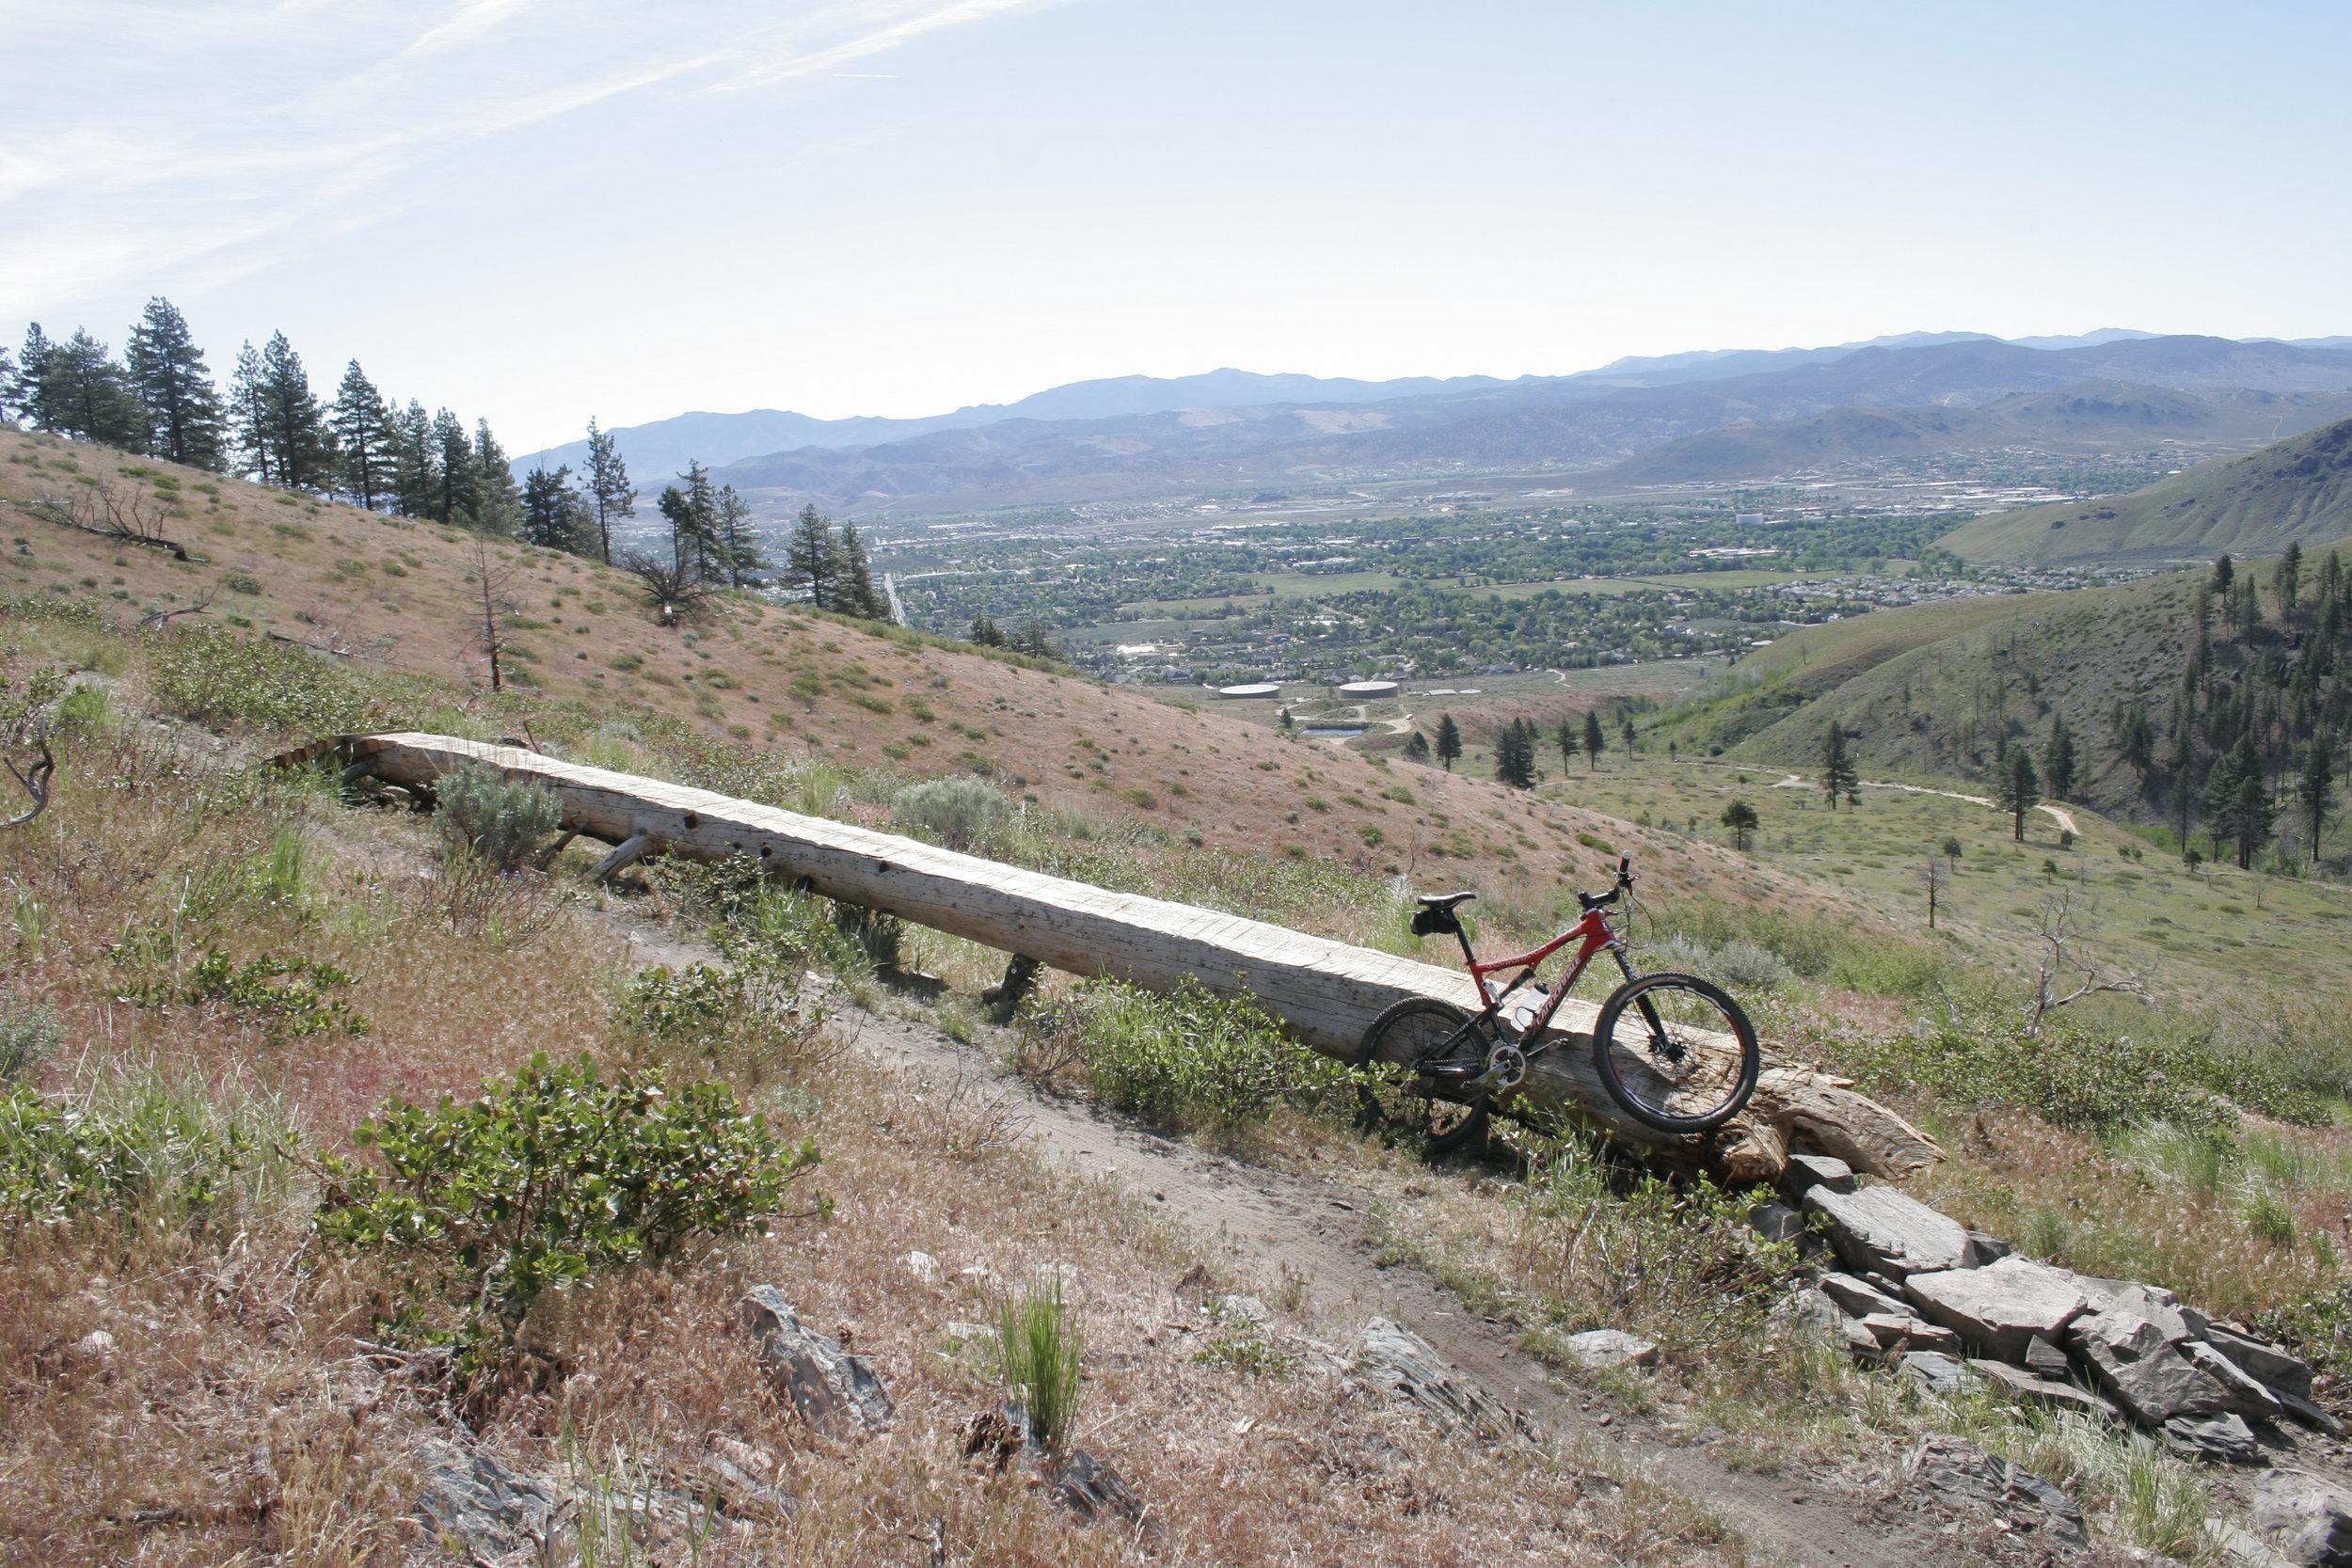 West Carson - Ash Canyon